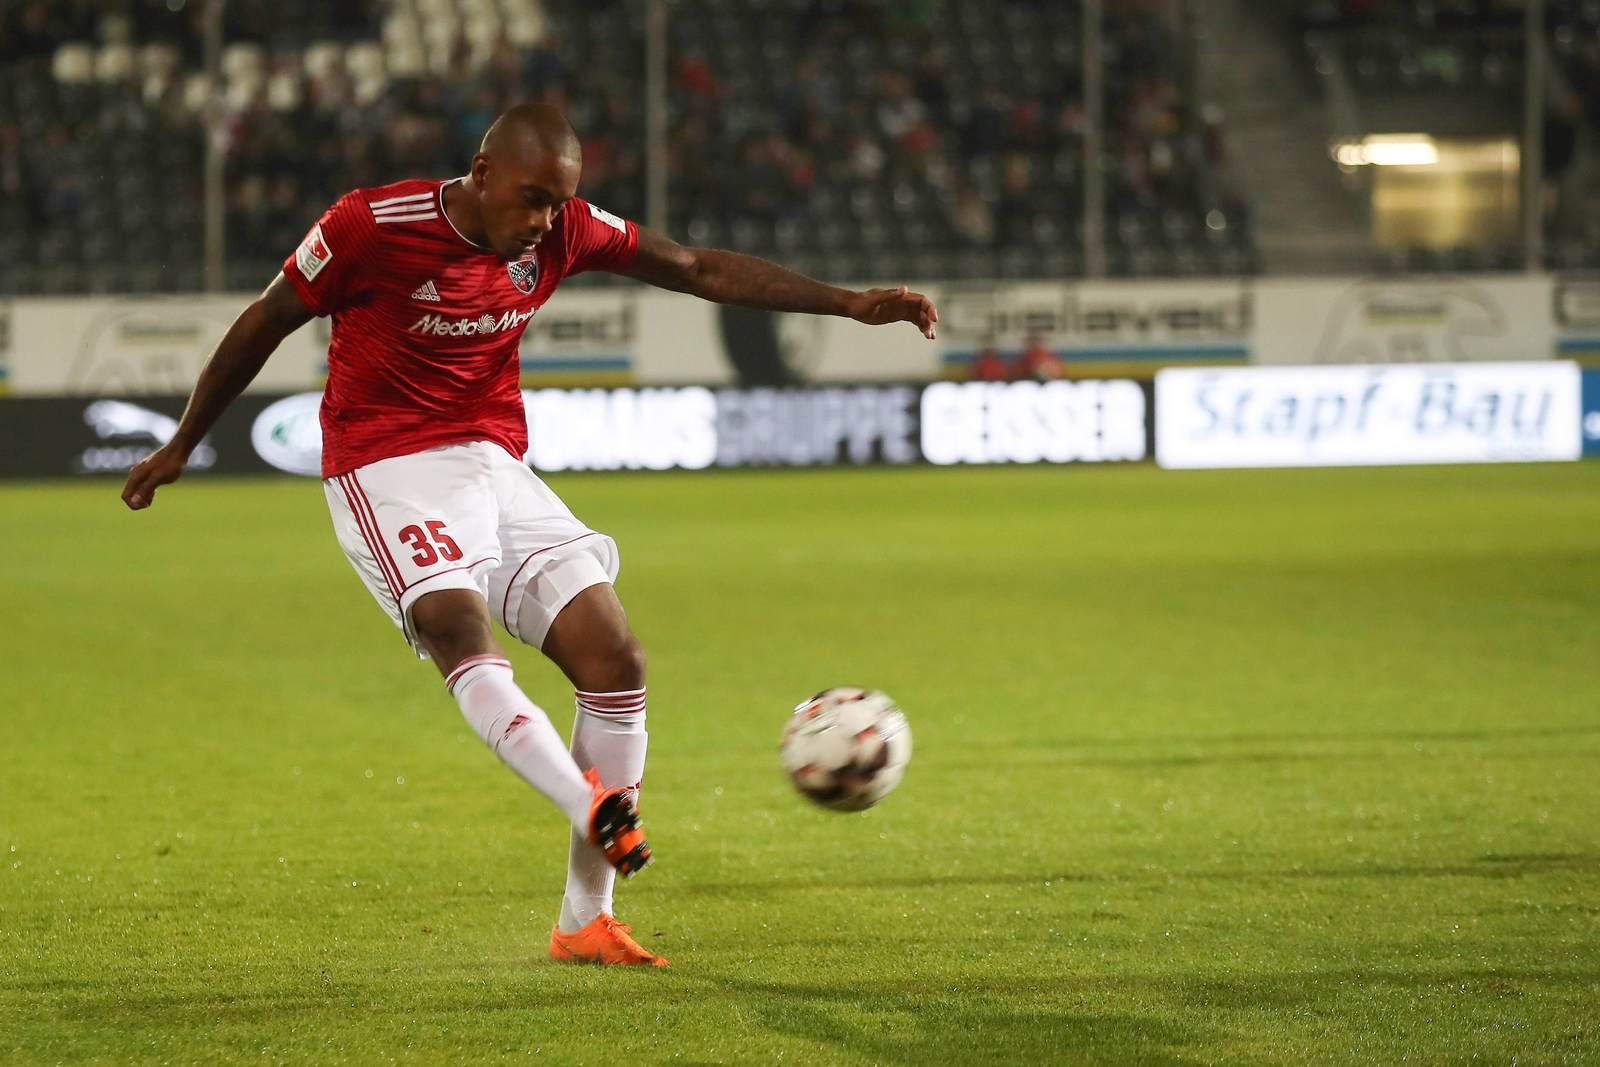 Charlison Benschop vom FC Ingolstadt